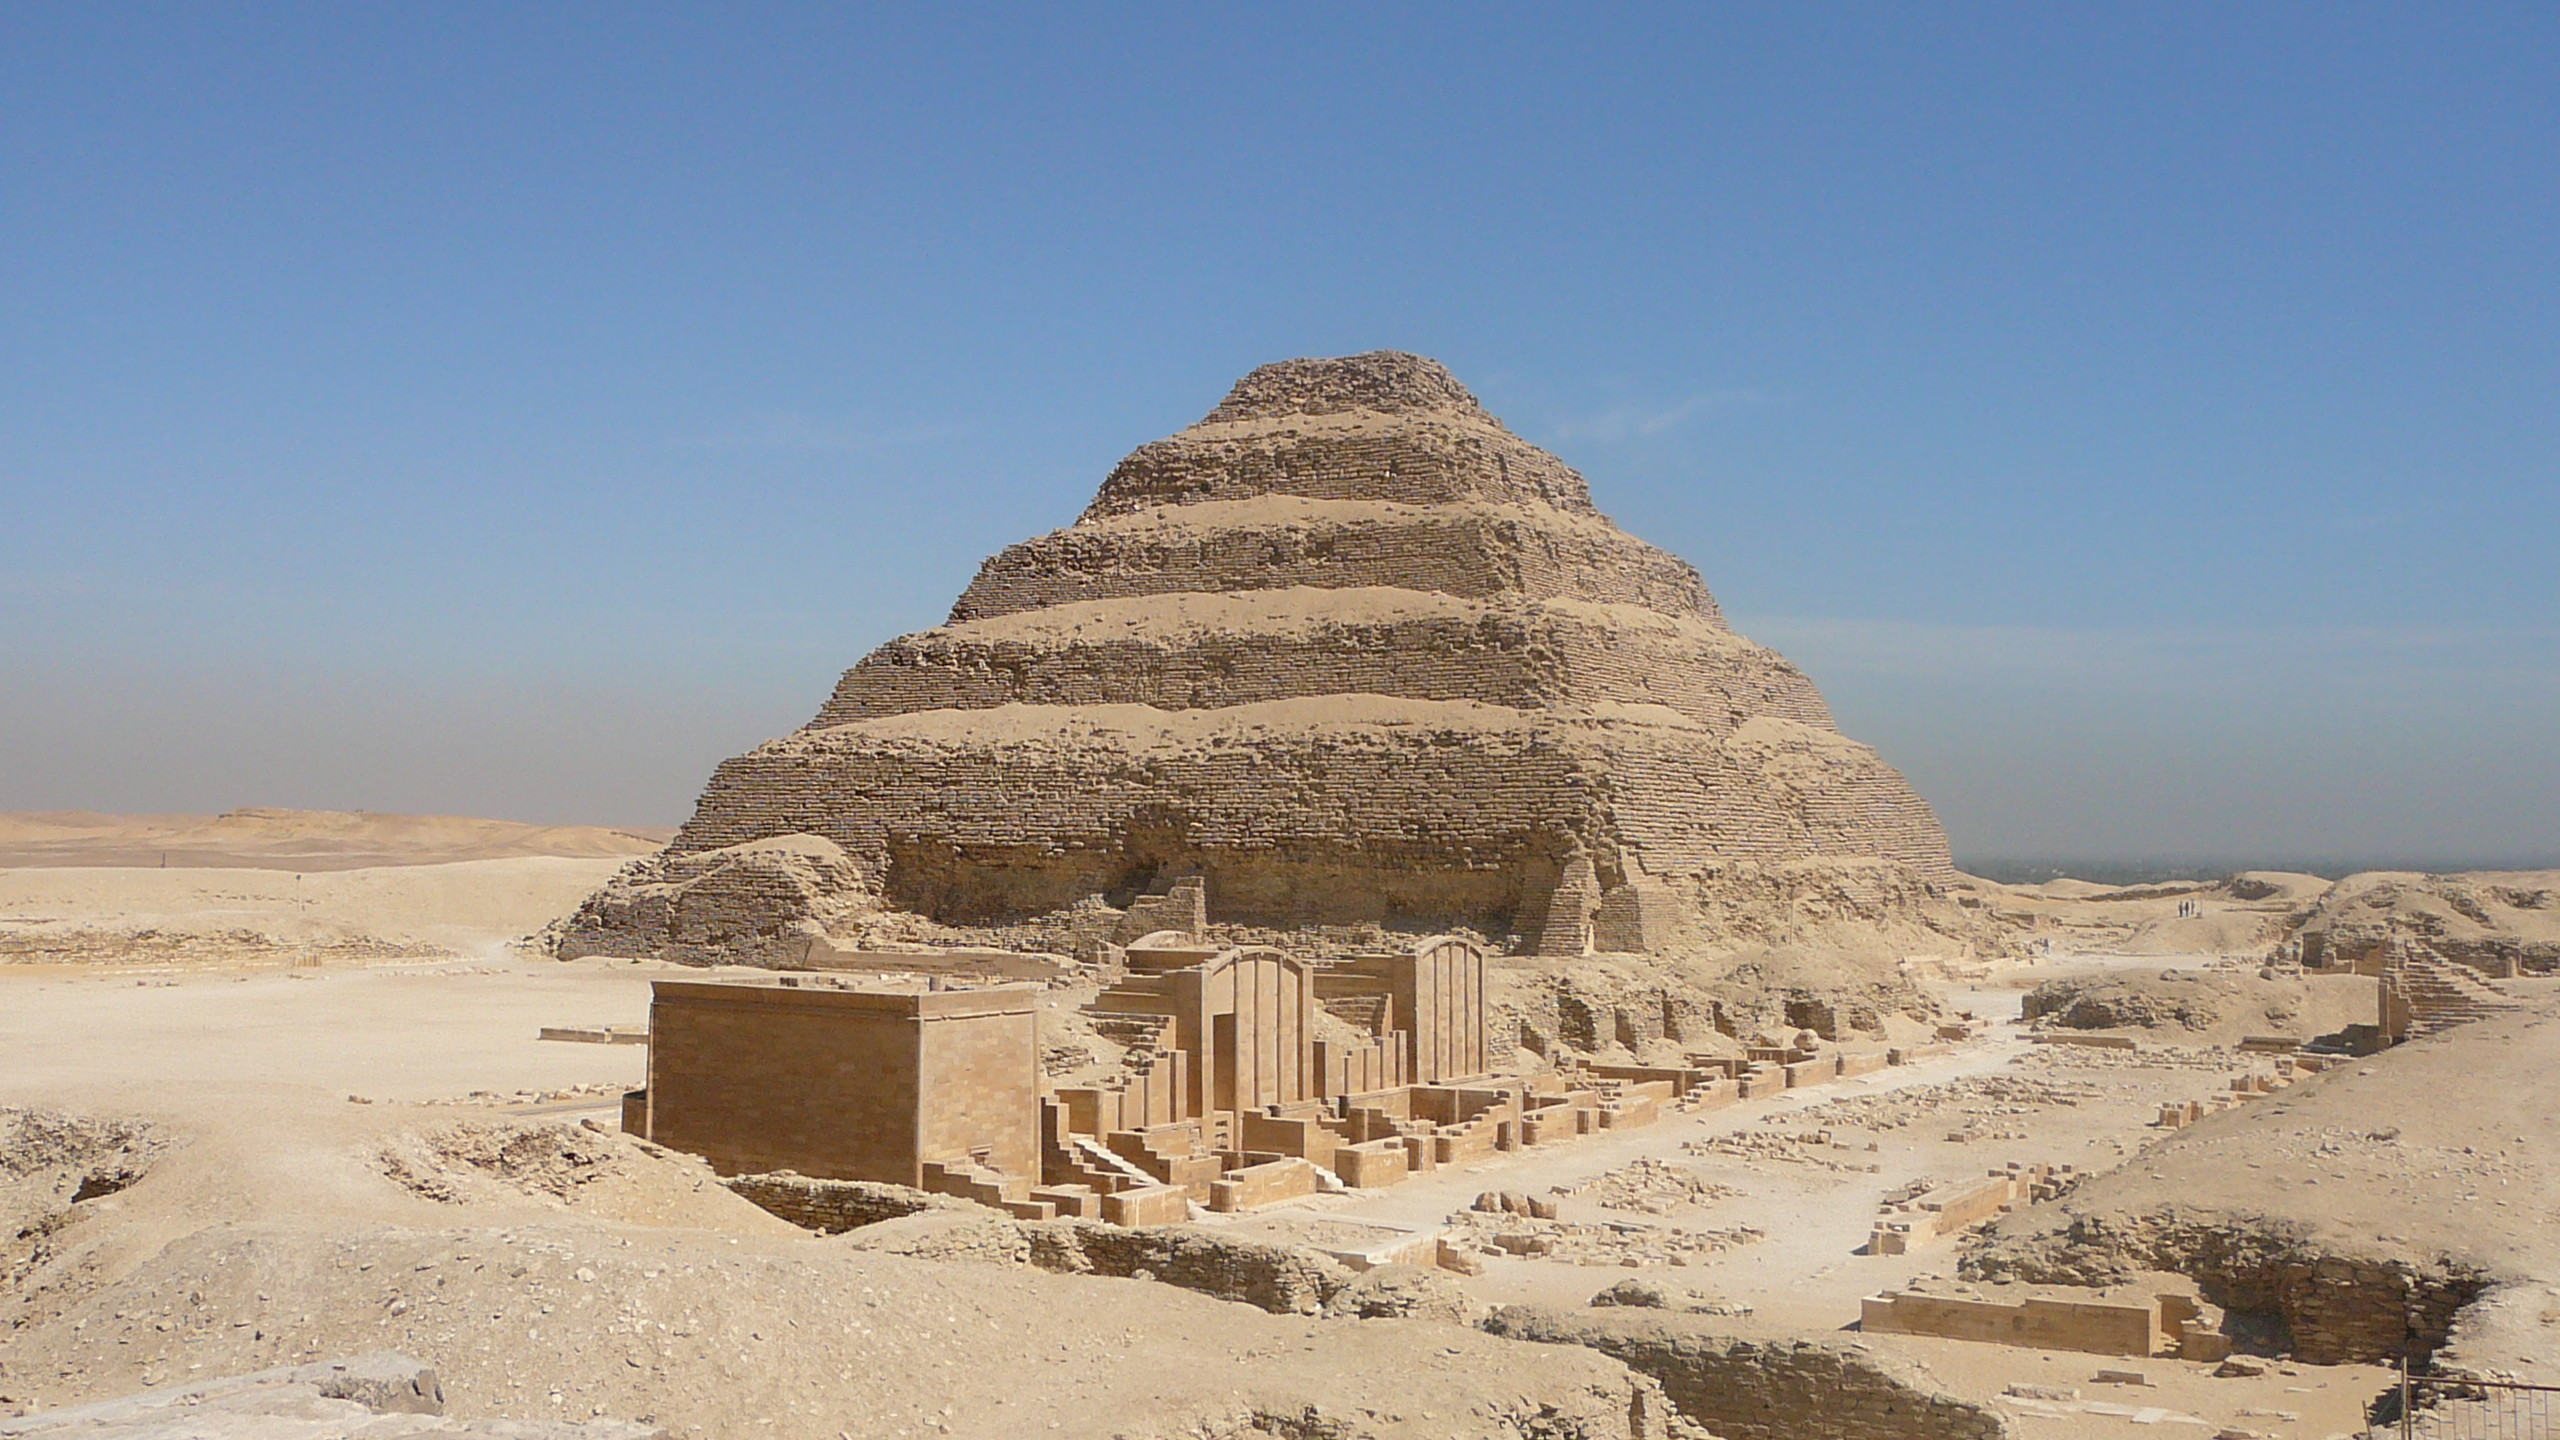 La pyramide du roi Djoser à Saqqarah